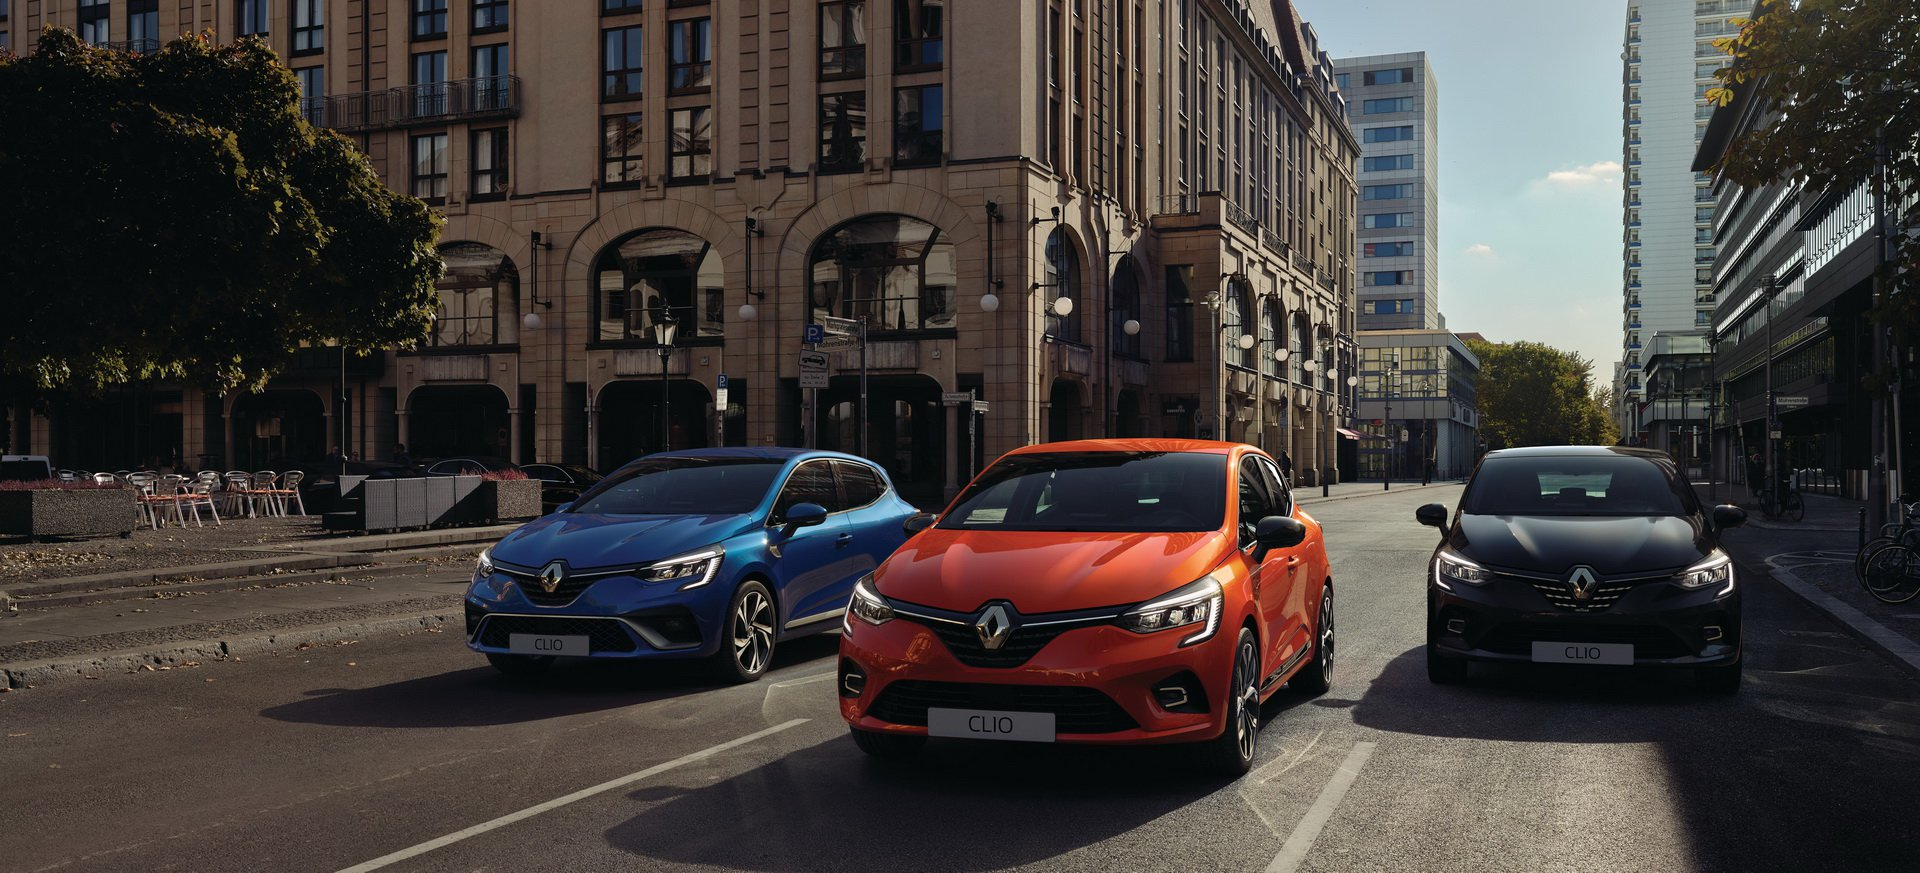 Renaultov atak na Ženevu